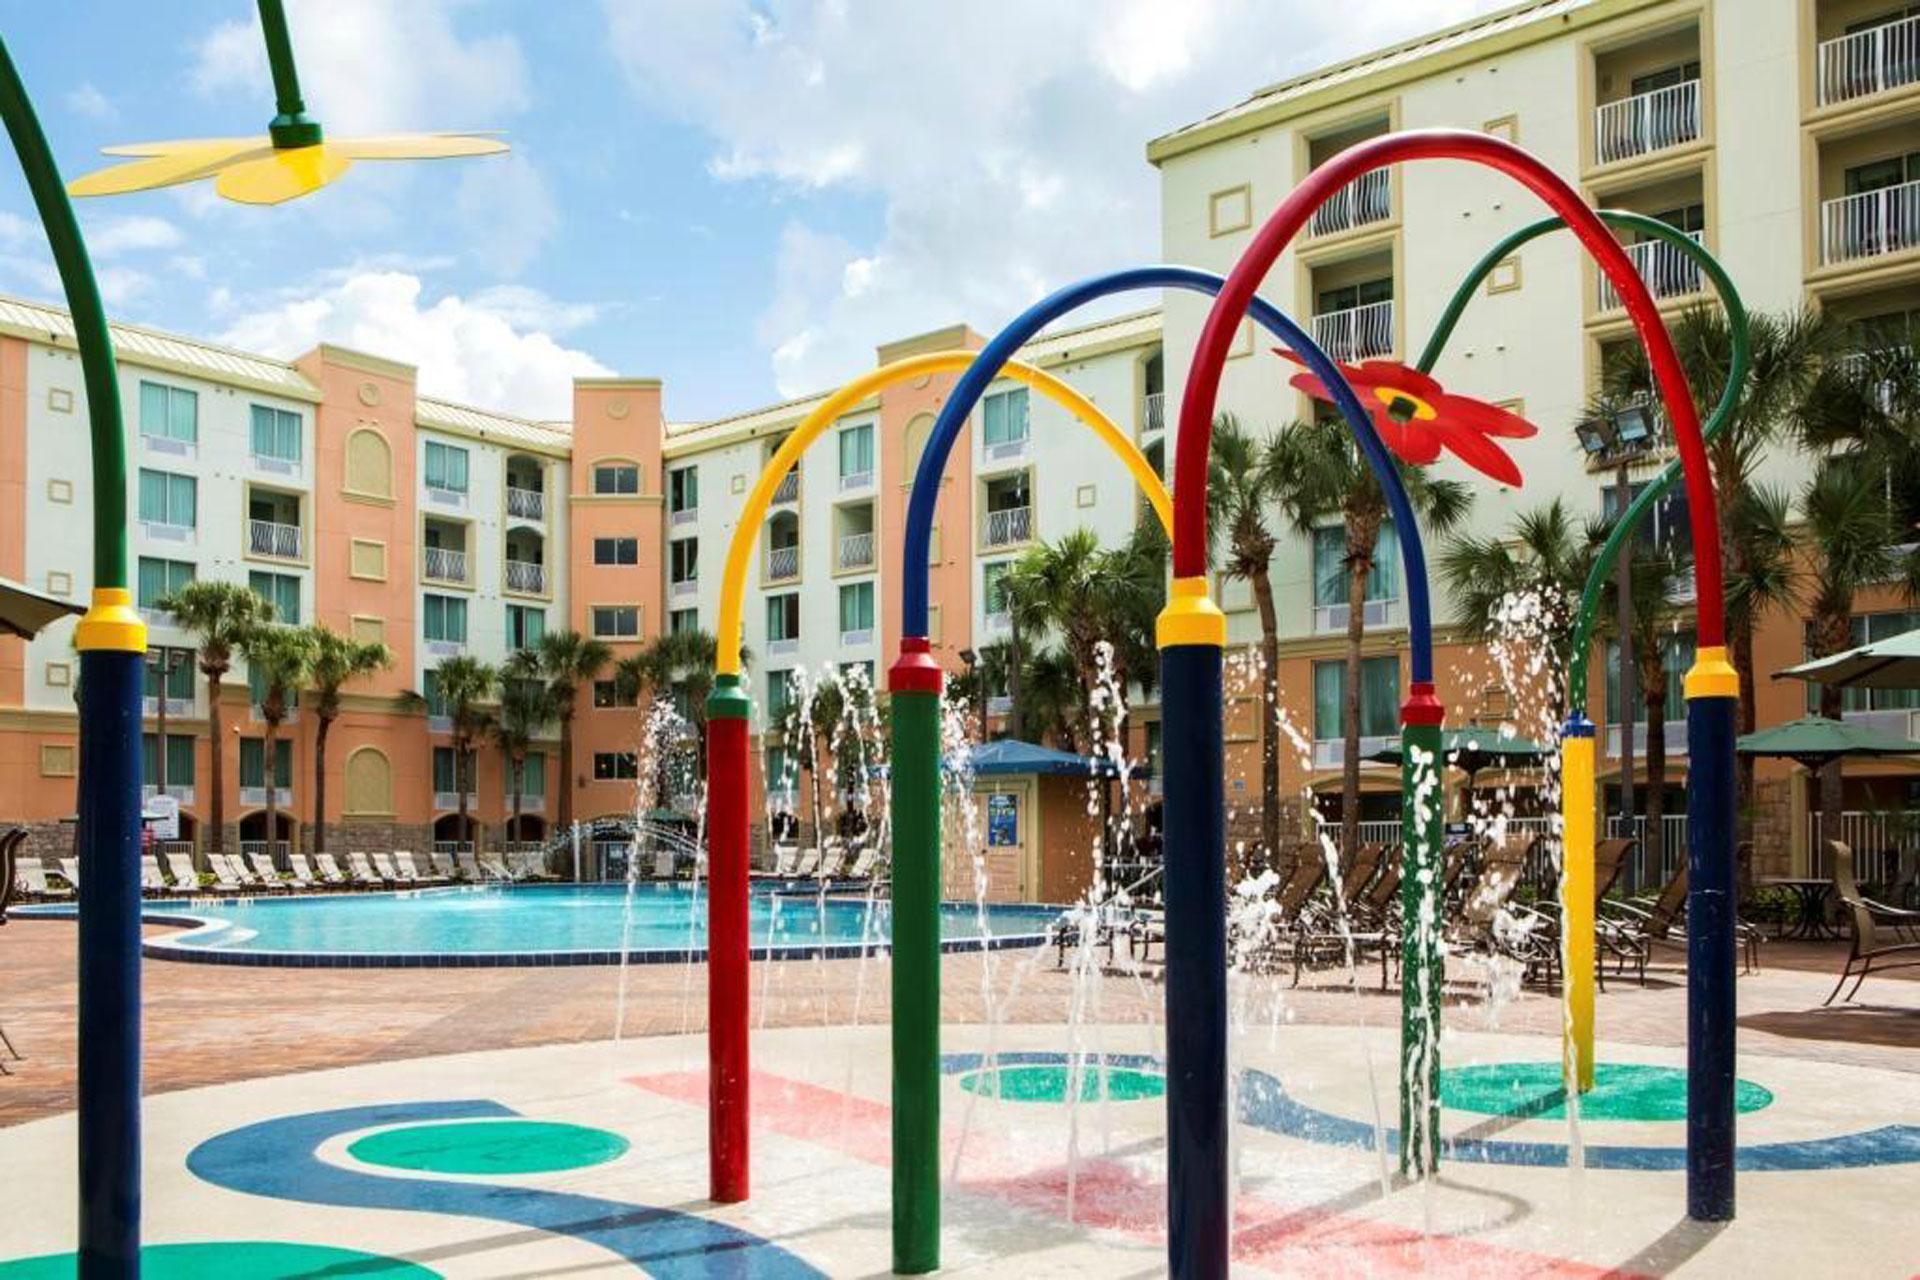 Spray Ground at Holiday Inn Buena Vista in Orlando